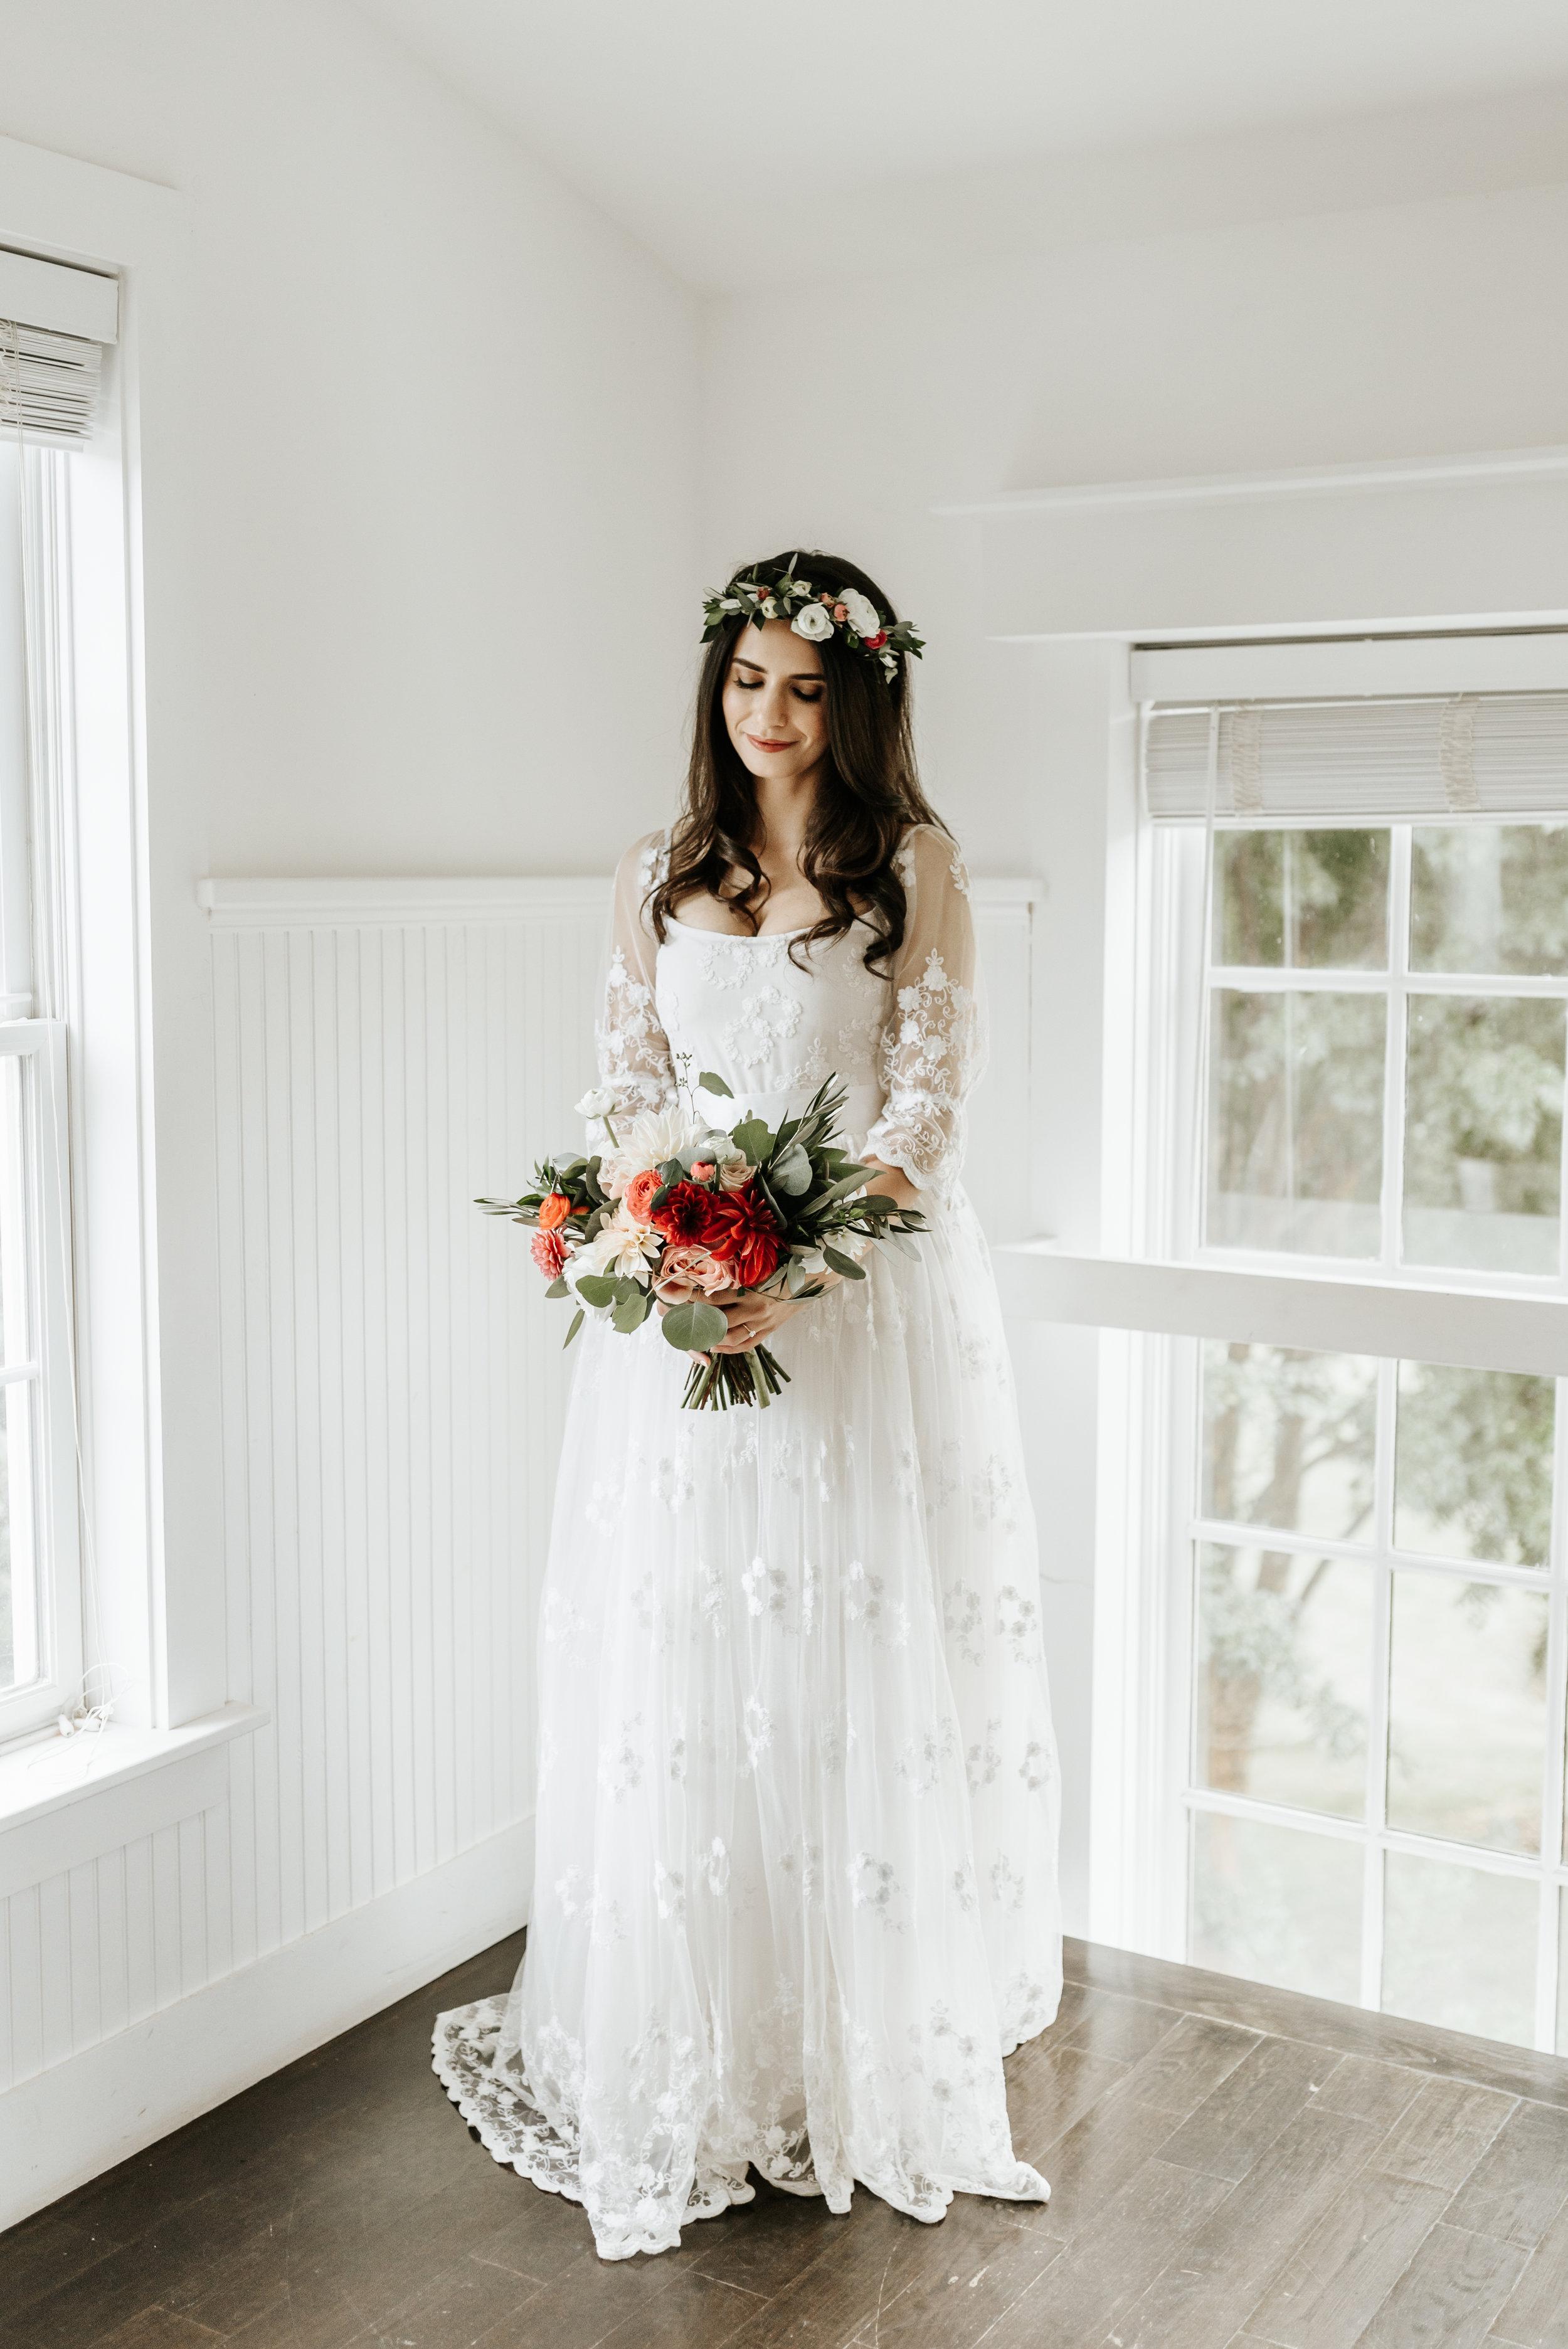 Veritas-Vineyards-and-Winery-Wedding-Photography-Afton-Virginia-Yasmin-Seth-Photography-by-V-9171.jpg